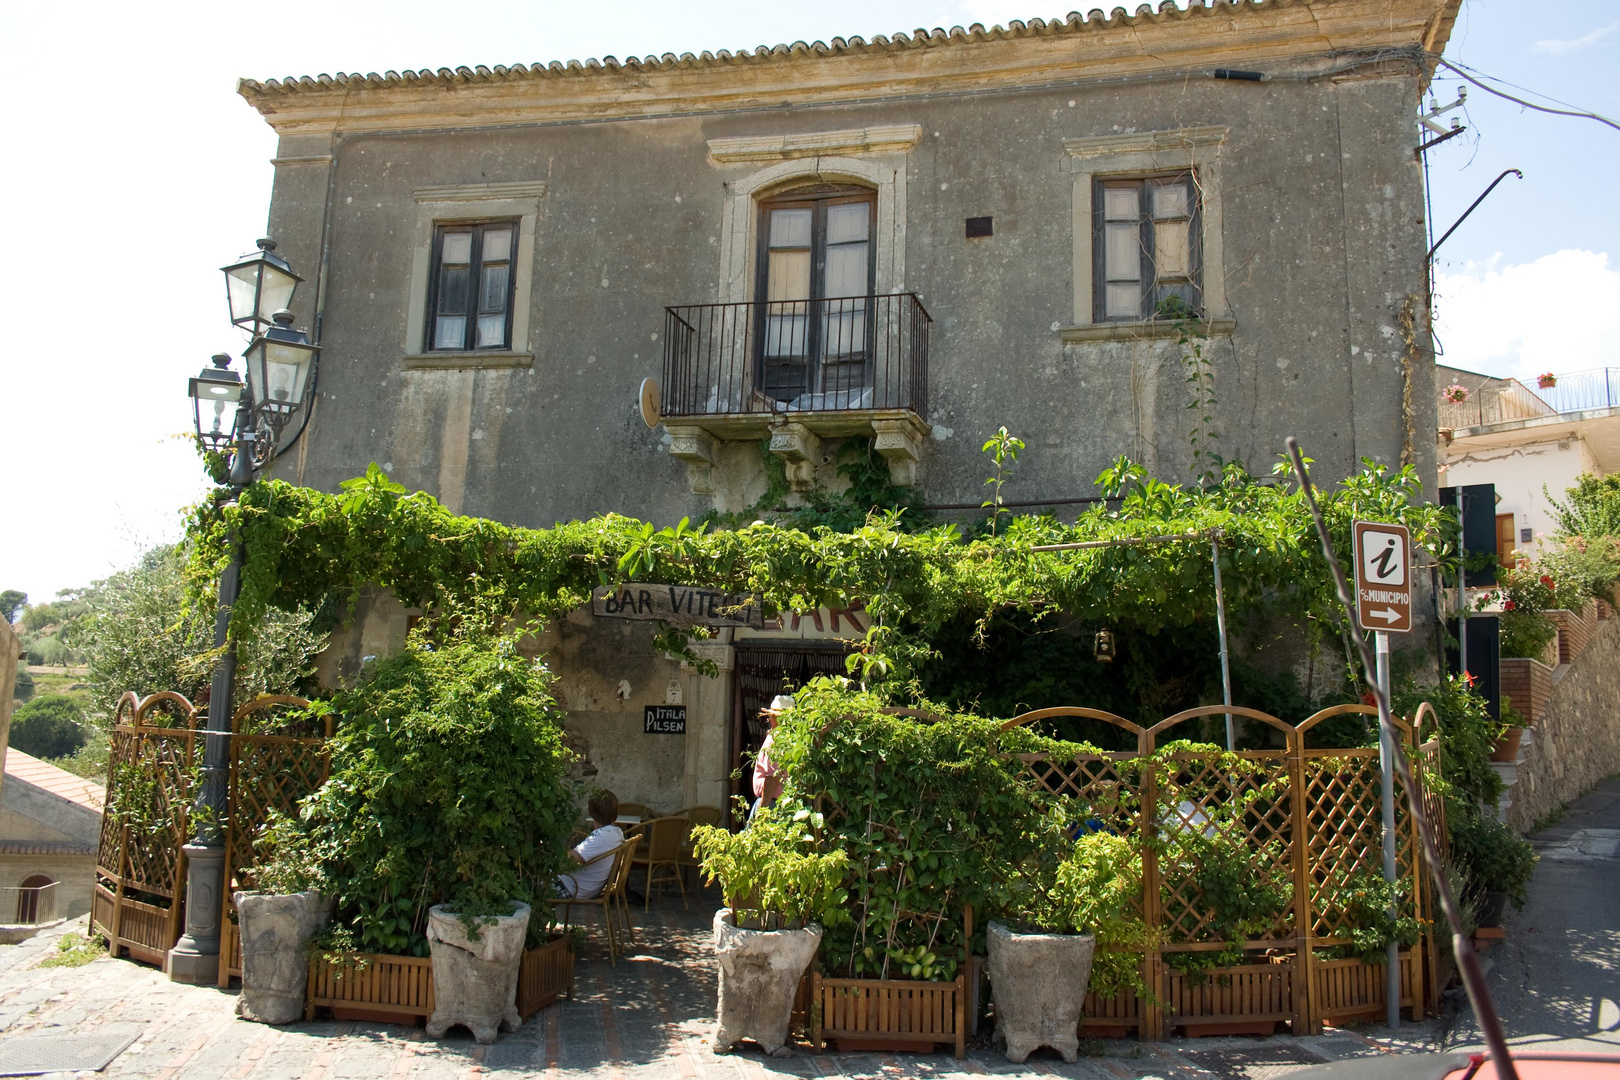 Bar Vitelli 2010